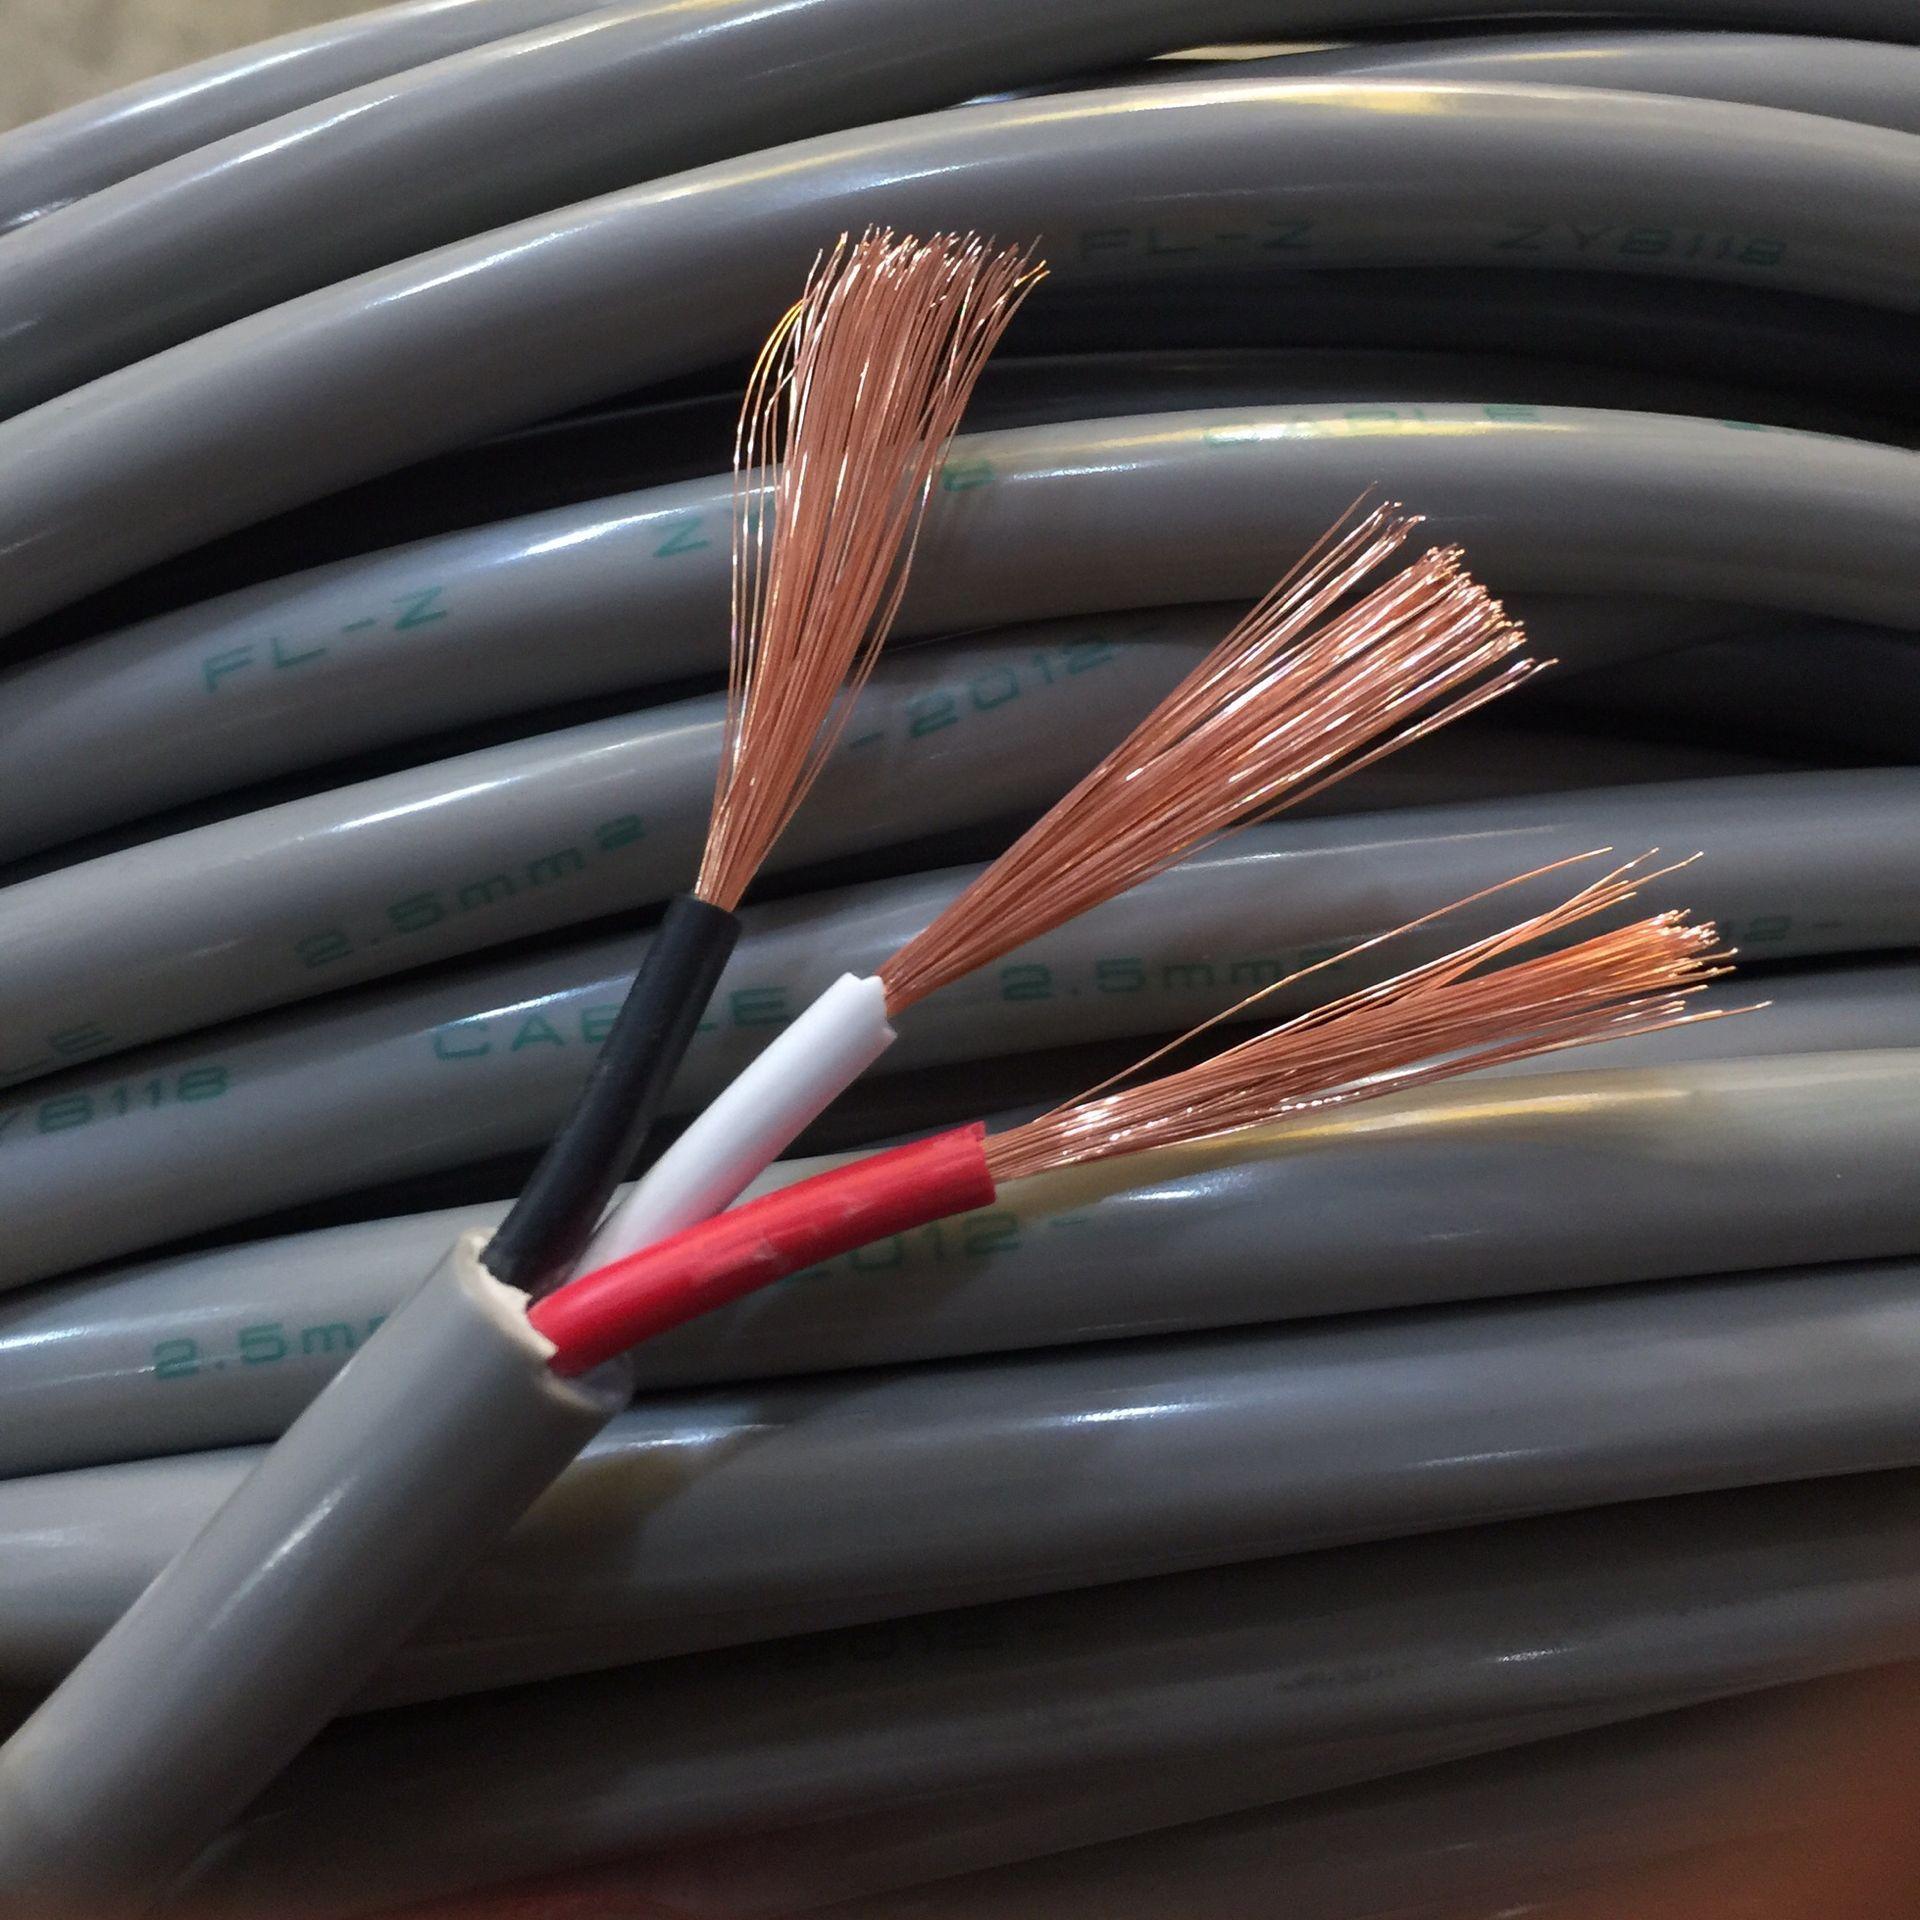 USD 5.74] Import 3 Core 2 5 square power cable standard wire 3 core ...